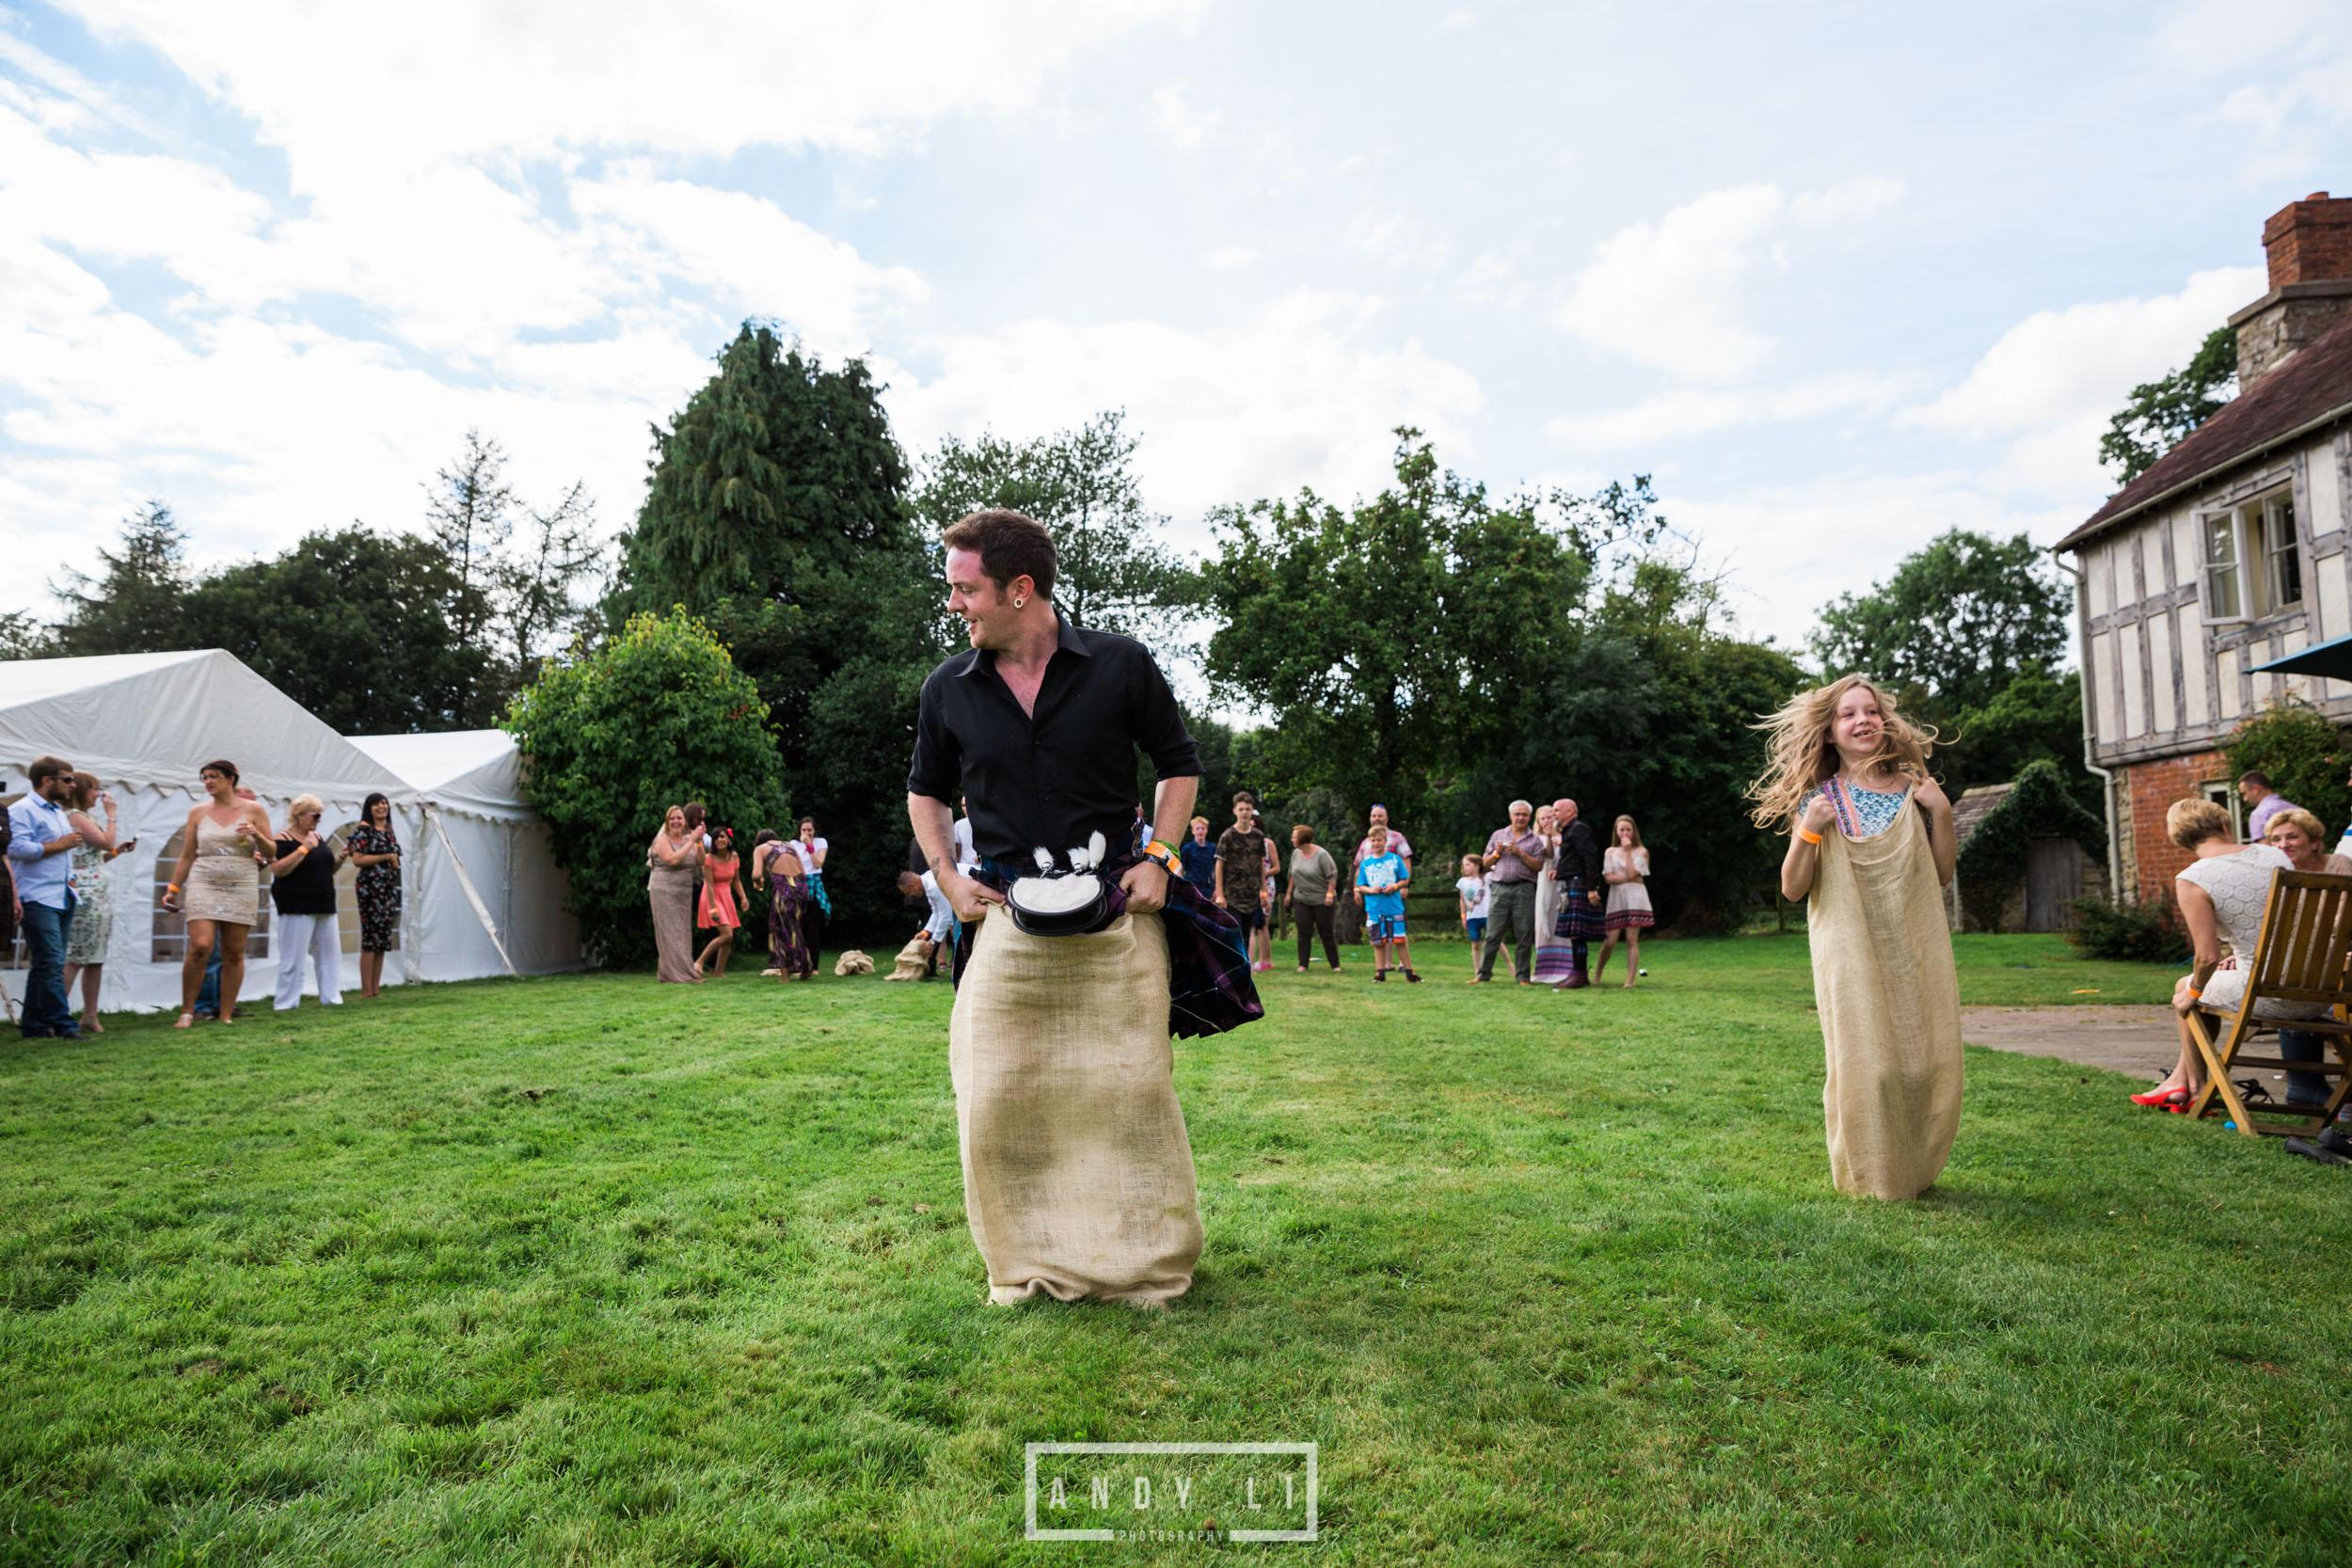 Festival Wedding Shropshire-Andy Li Photography-277.jpg